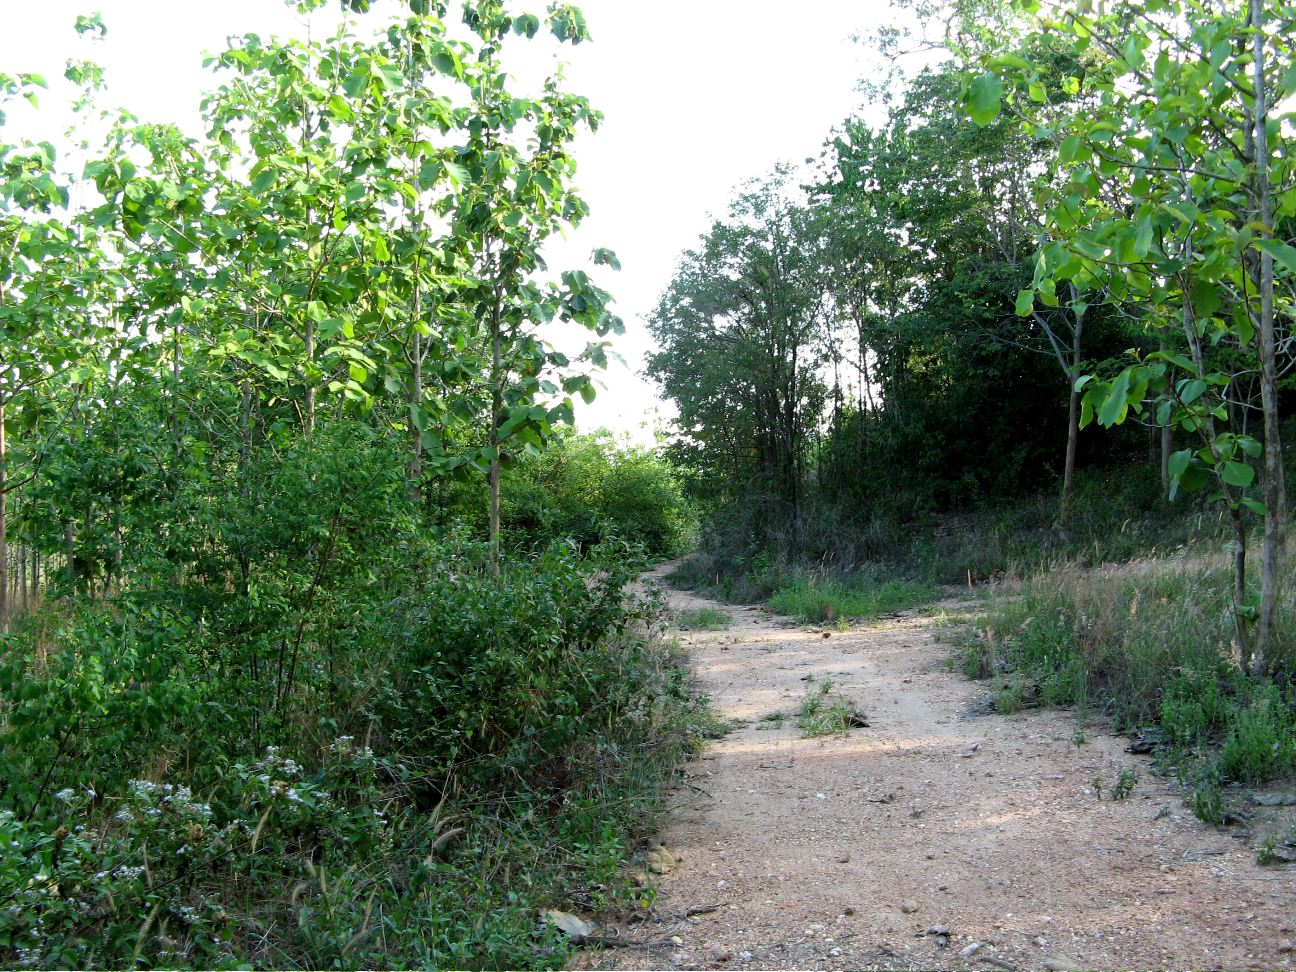 Wonder which path gets us home